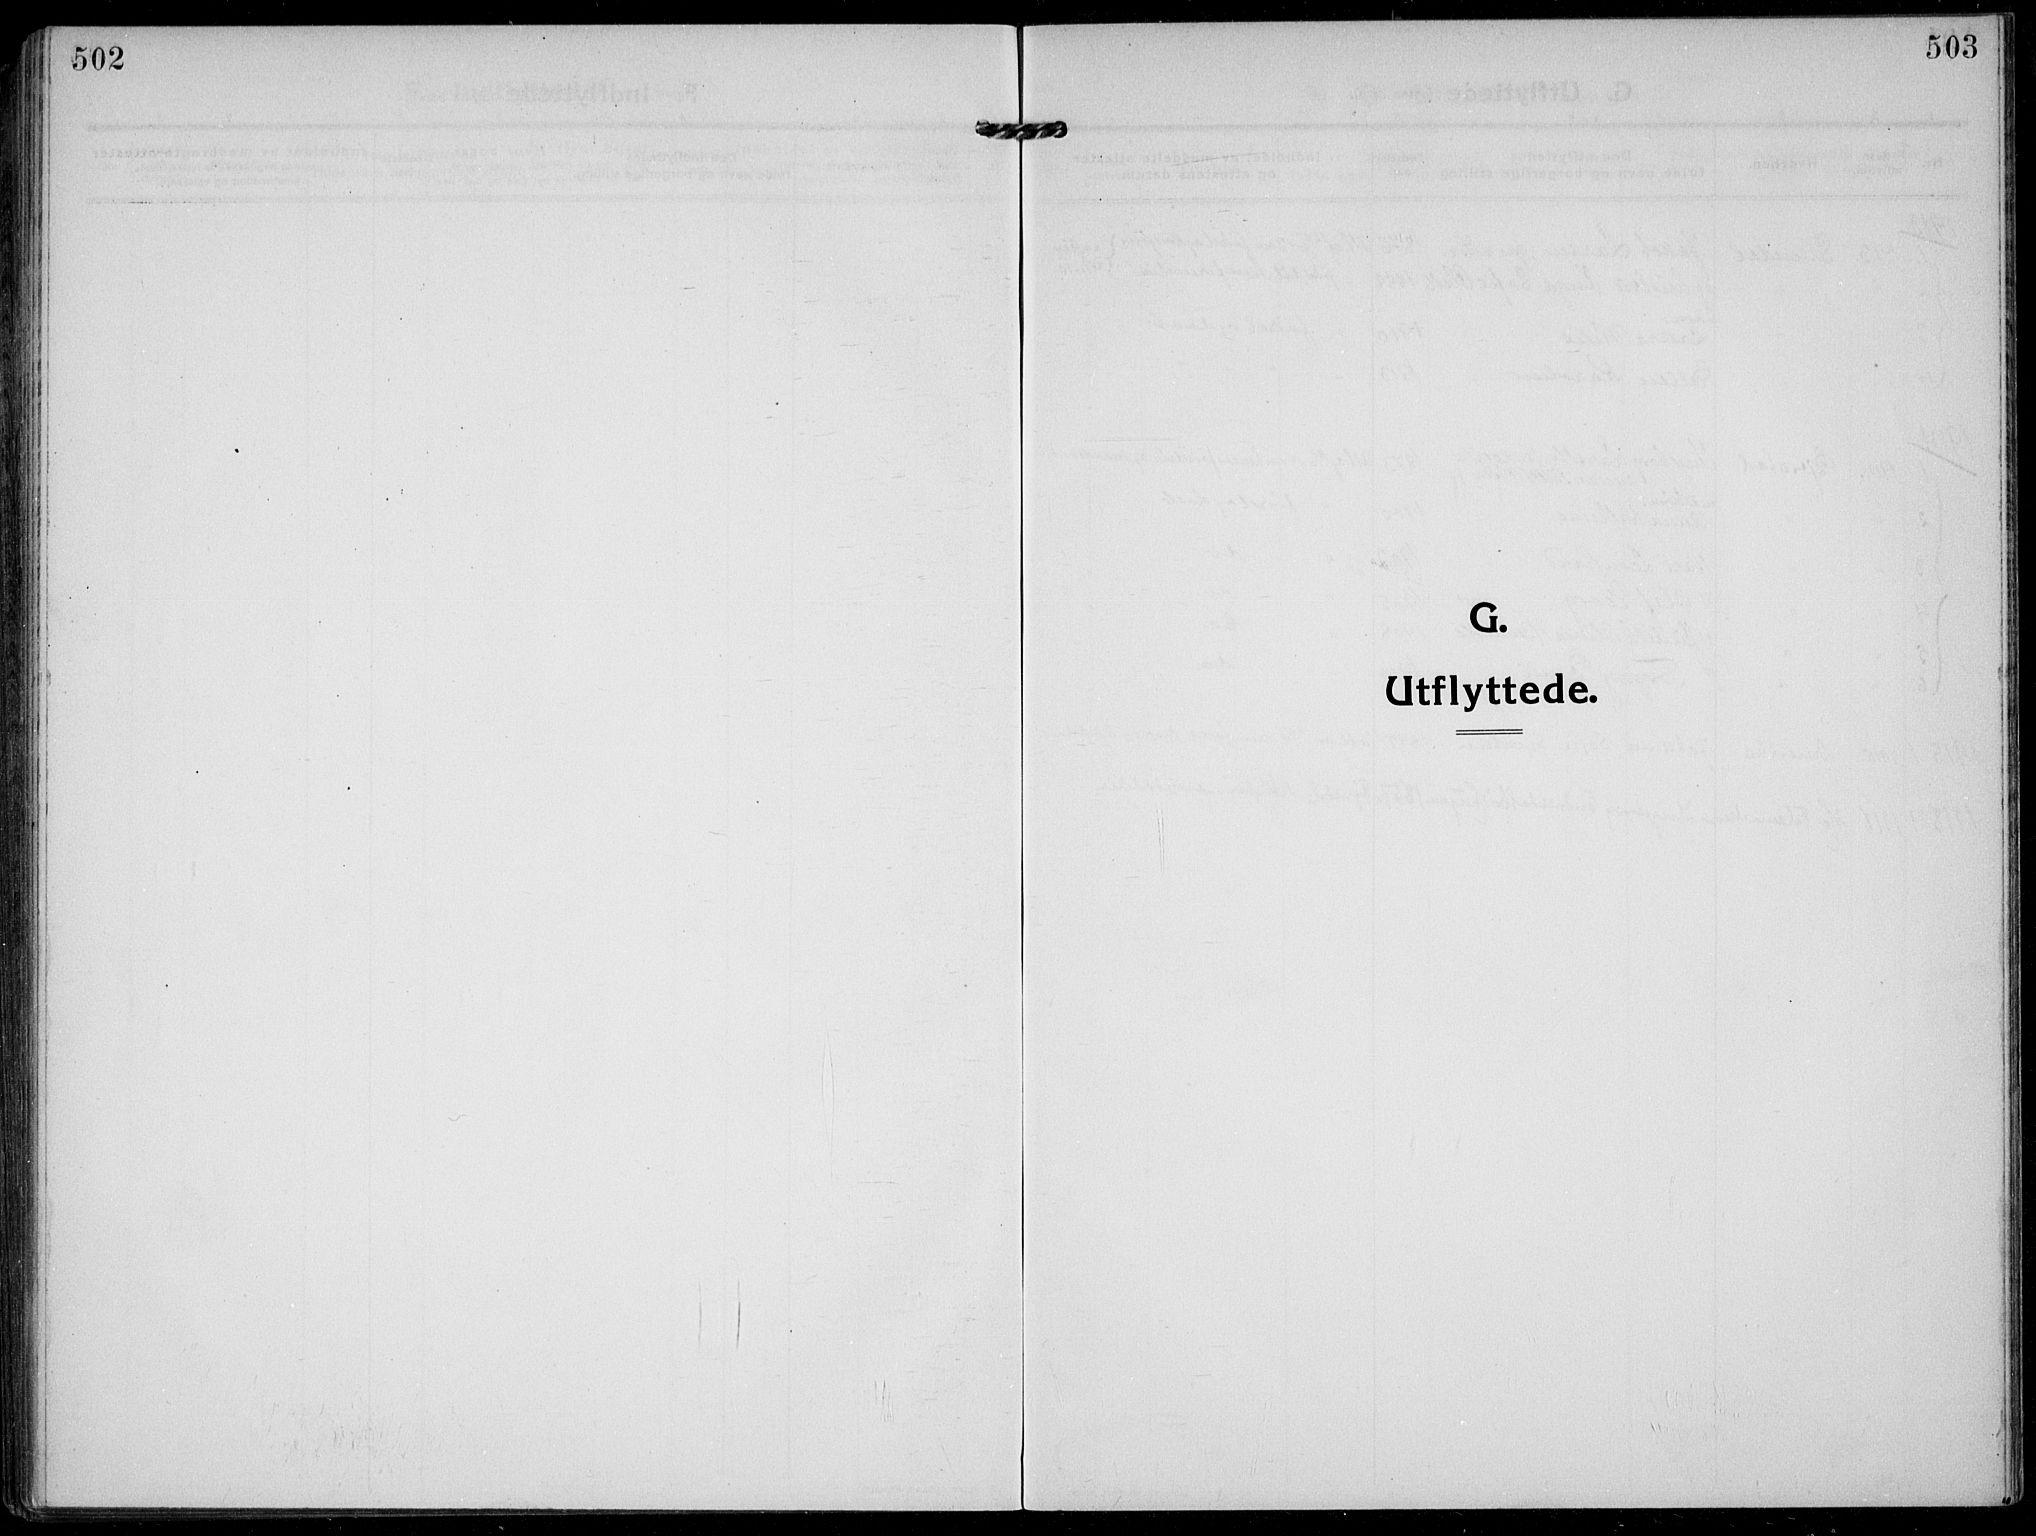 SAKO, Solum kirkebøker, F/Fb/L0004: Ministerialbok nr. II 4, 1913-1924, s. 502-503